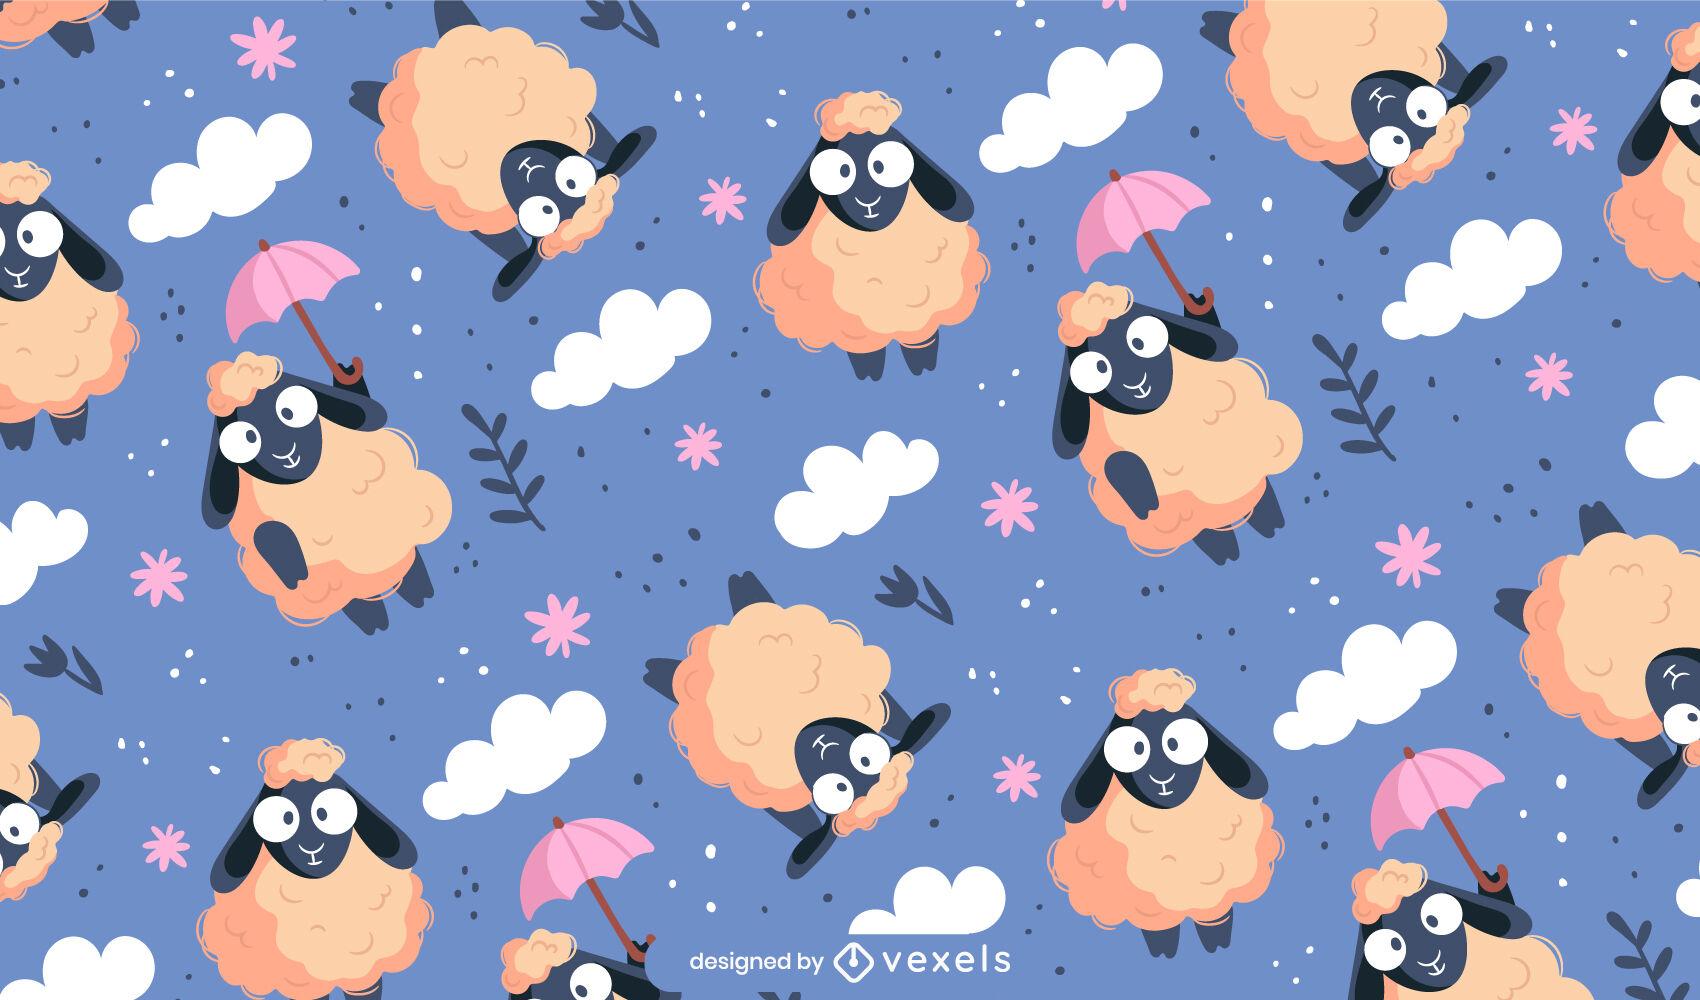 Cute flying sheep animal pattern design